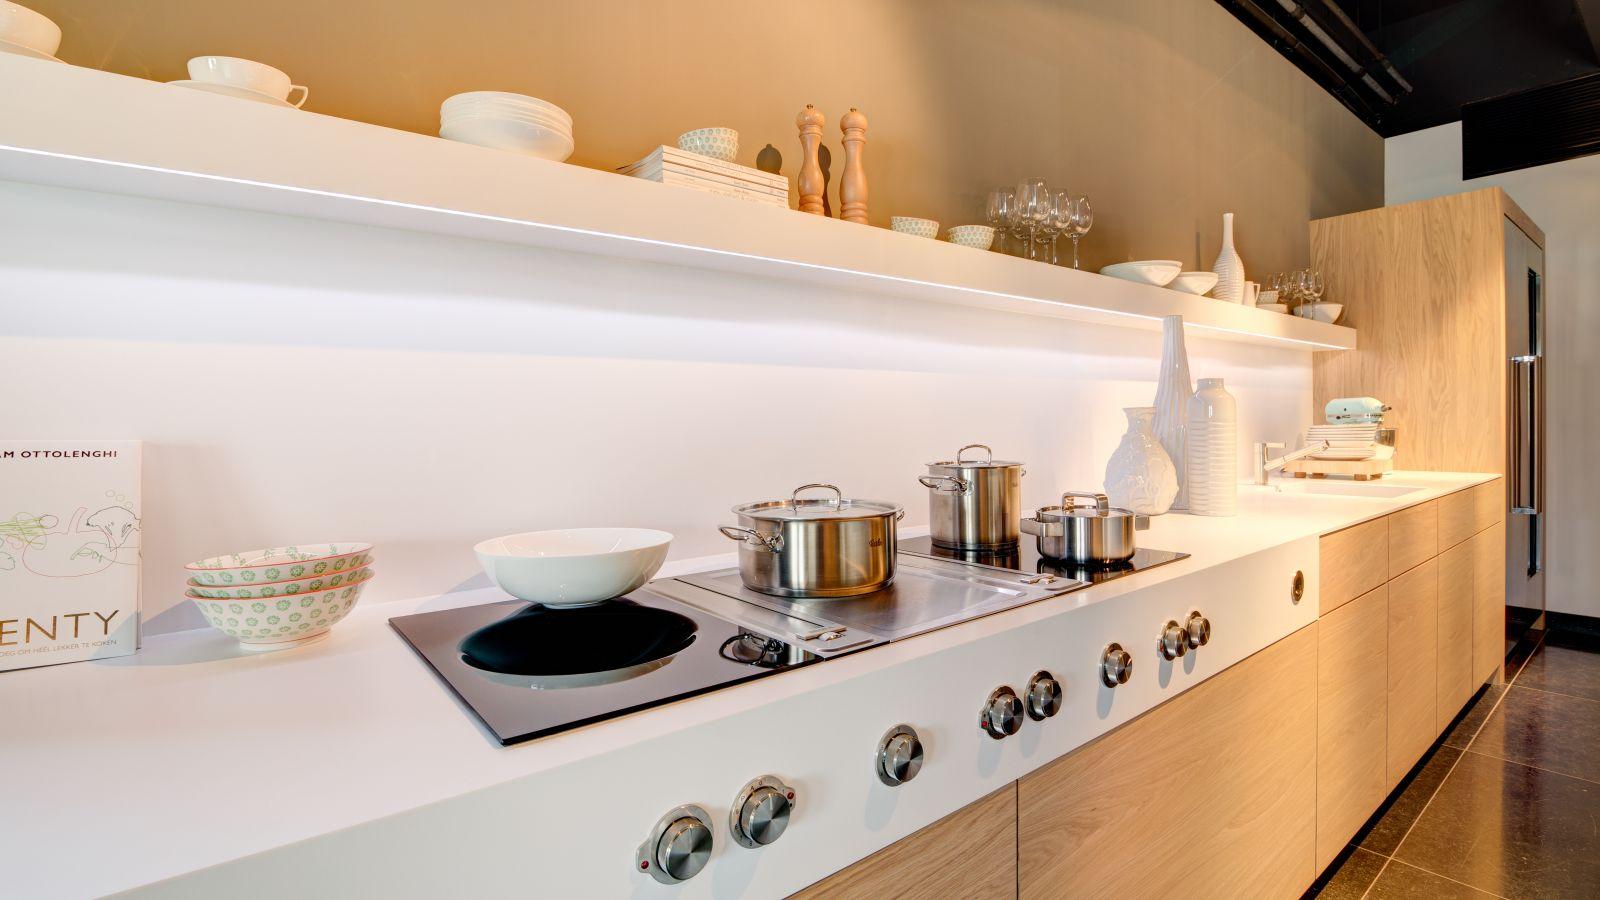 Klijn badkamers kaatsheuvel u keukenarchitectuur